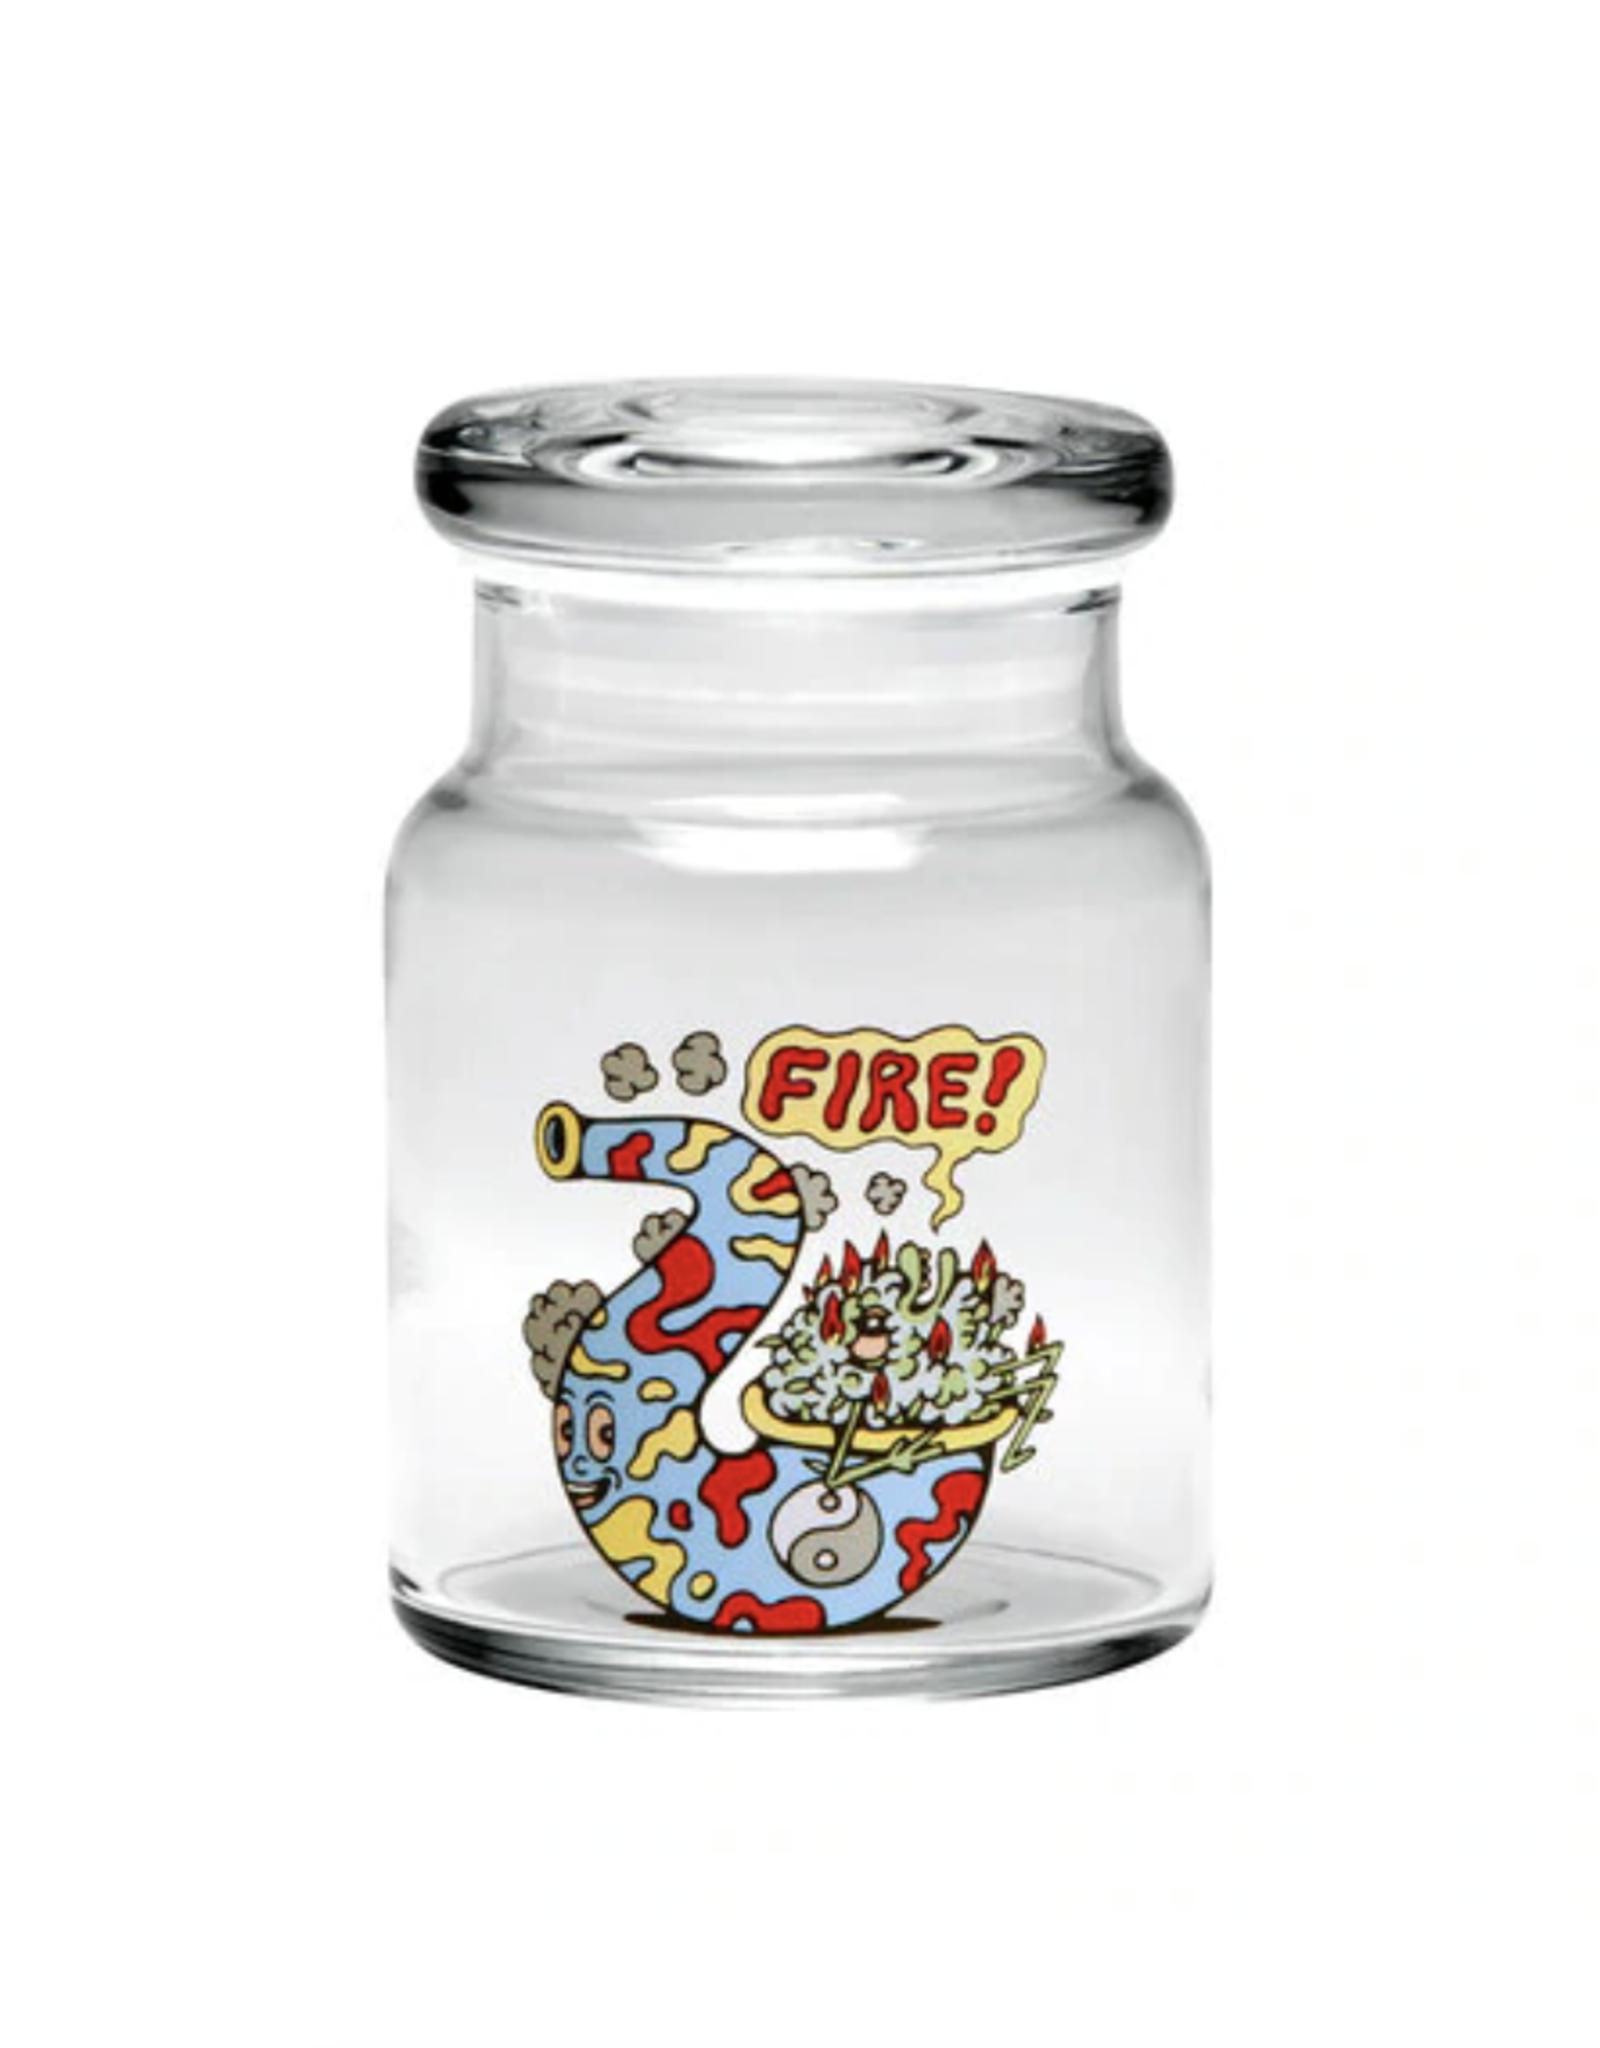 420 Science Pop Top Jar - Fire Bud